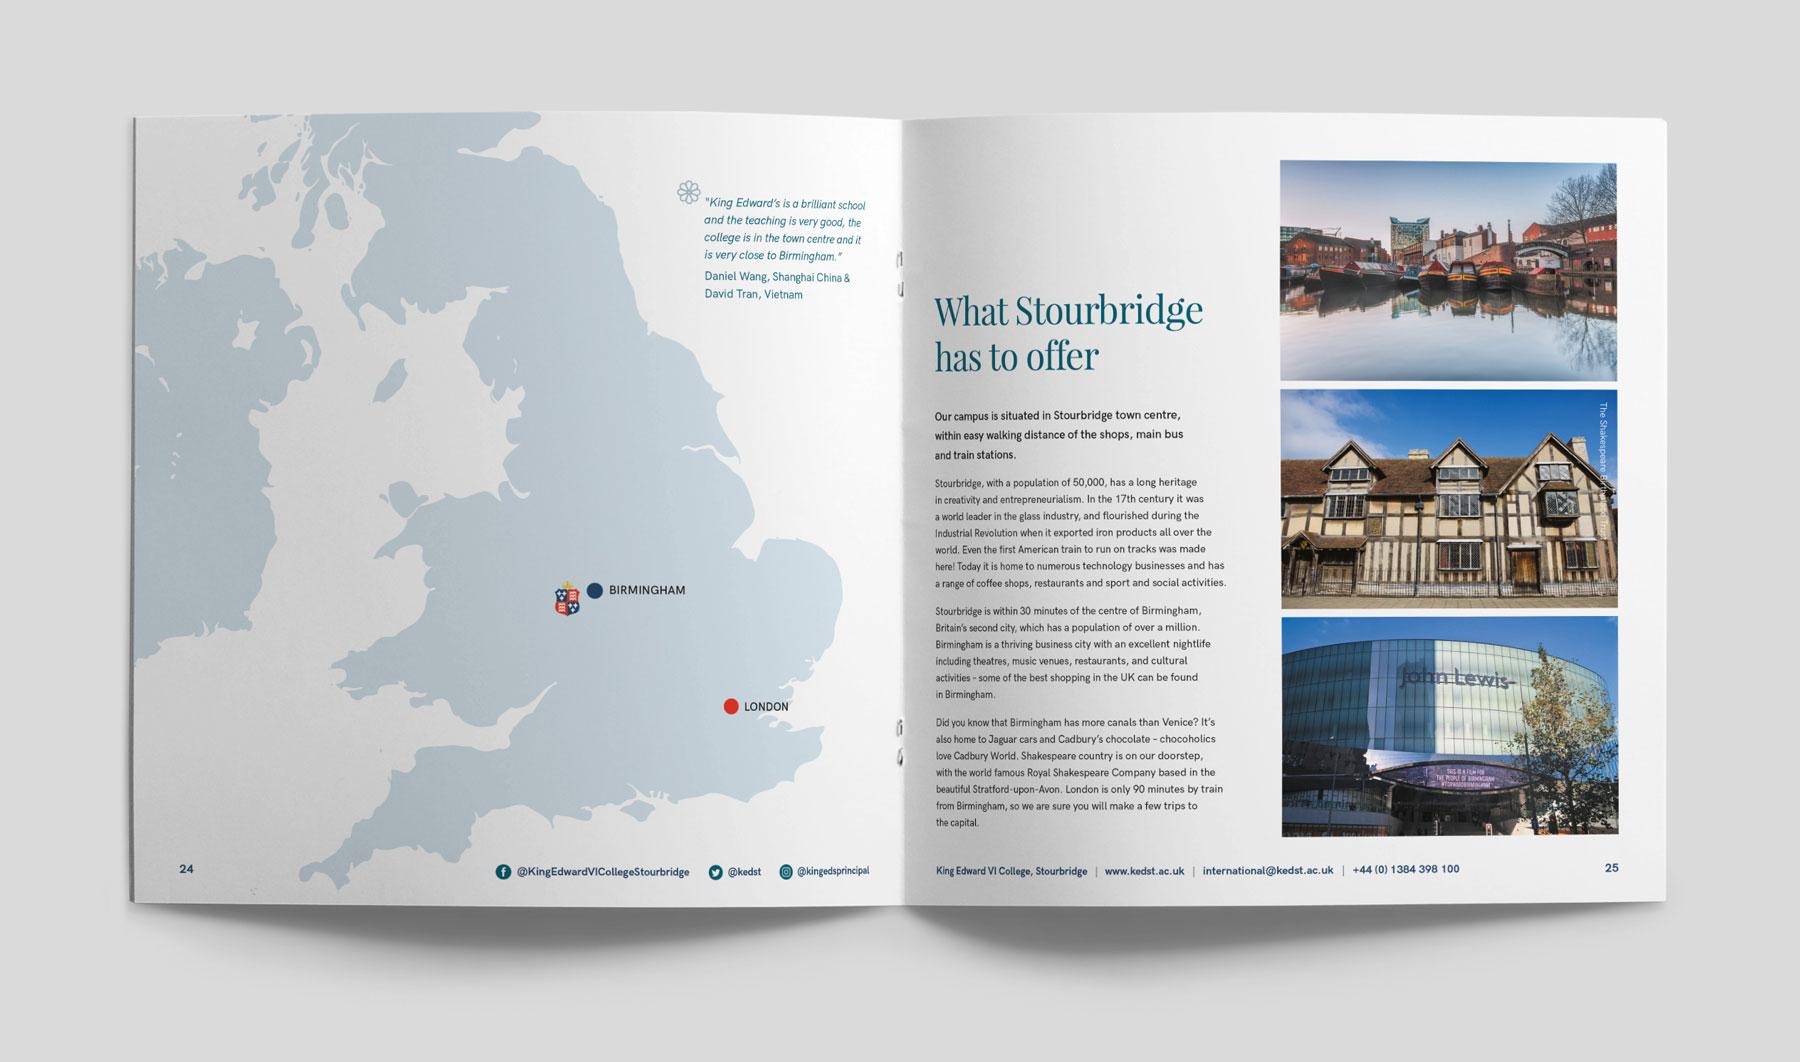 King Edward VI College Stourbridge rebrand